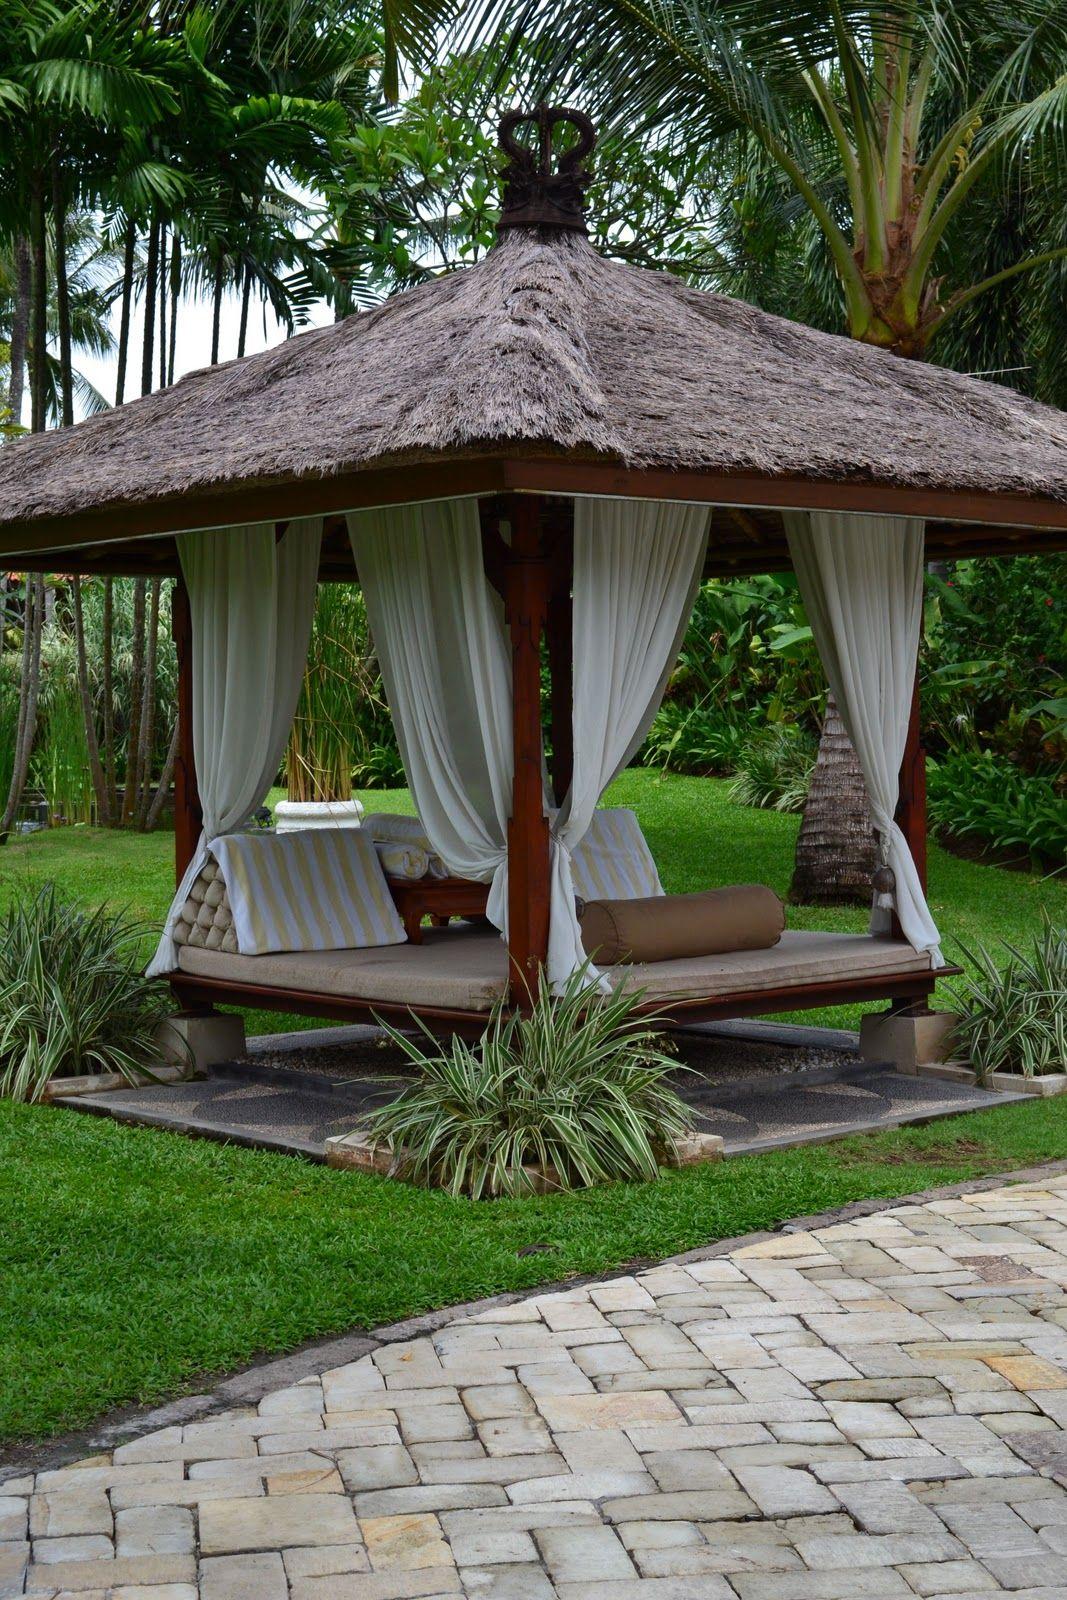 I can totally make that: Laguna Hotel, Nusa Dua, Bali | The dream ...